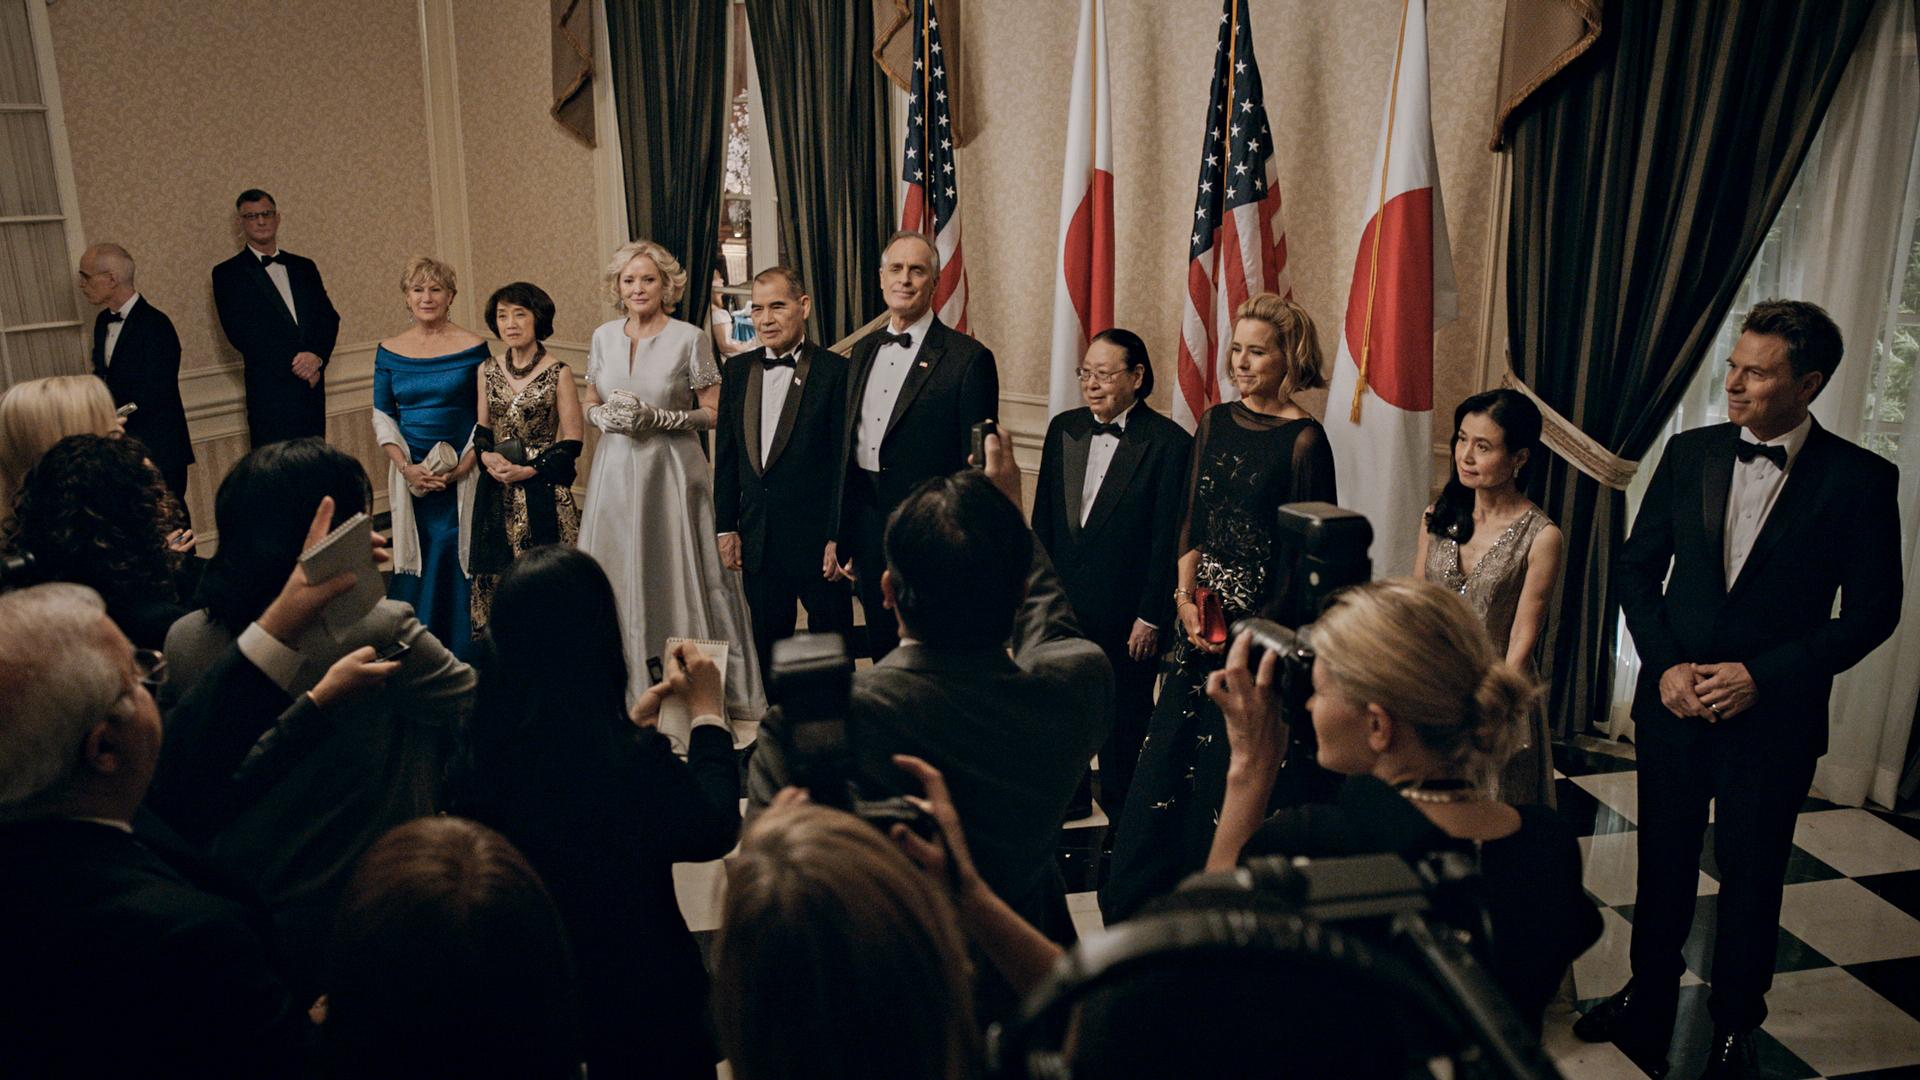 Watch Madam Secretary Season 4 Episode 12: Sound and Fury - Full show on  CBS All Access